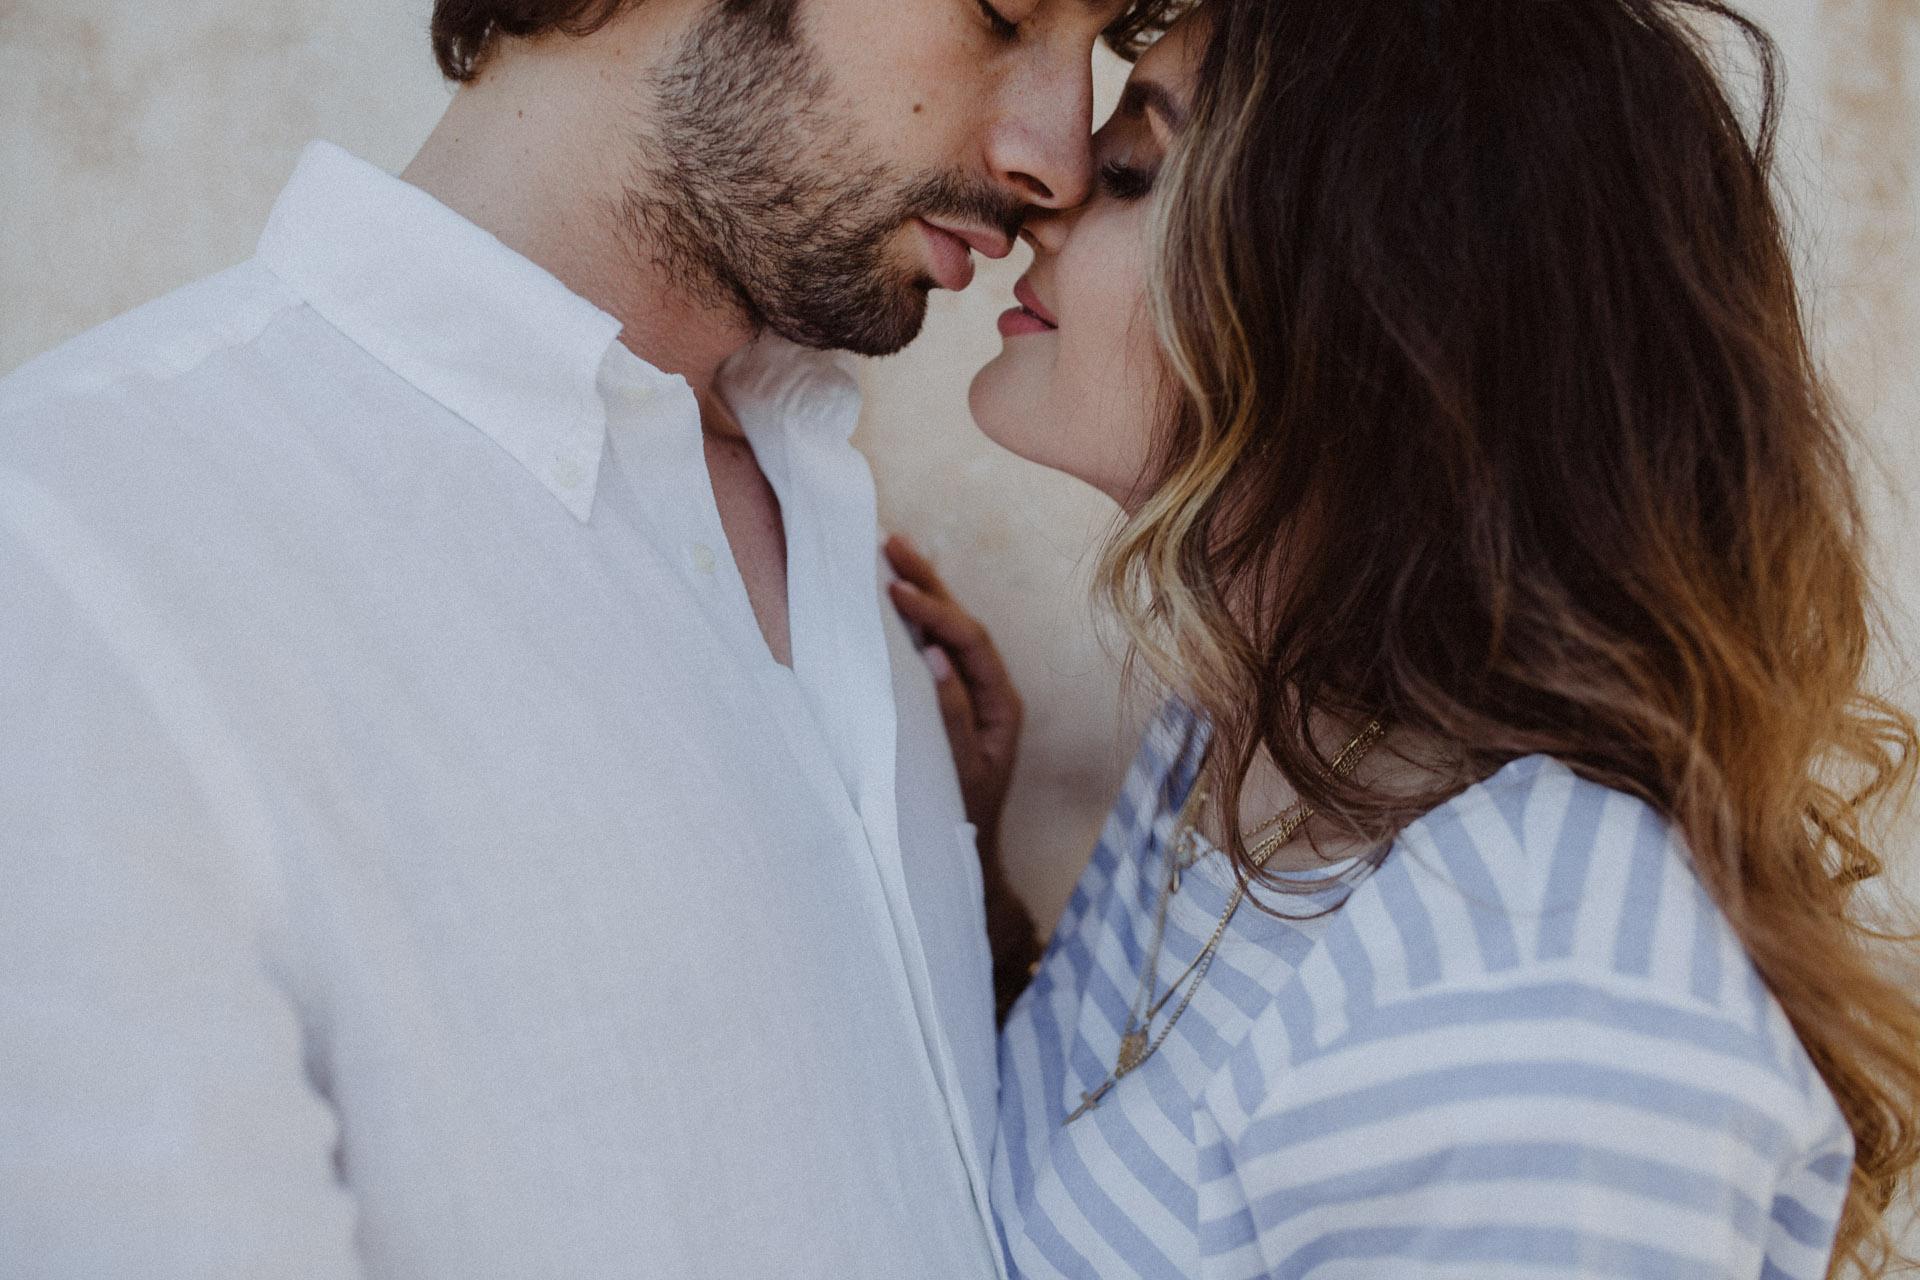 coupleshooting-roma-hochzeitsfotografen-wien-agnesundandi-12